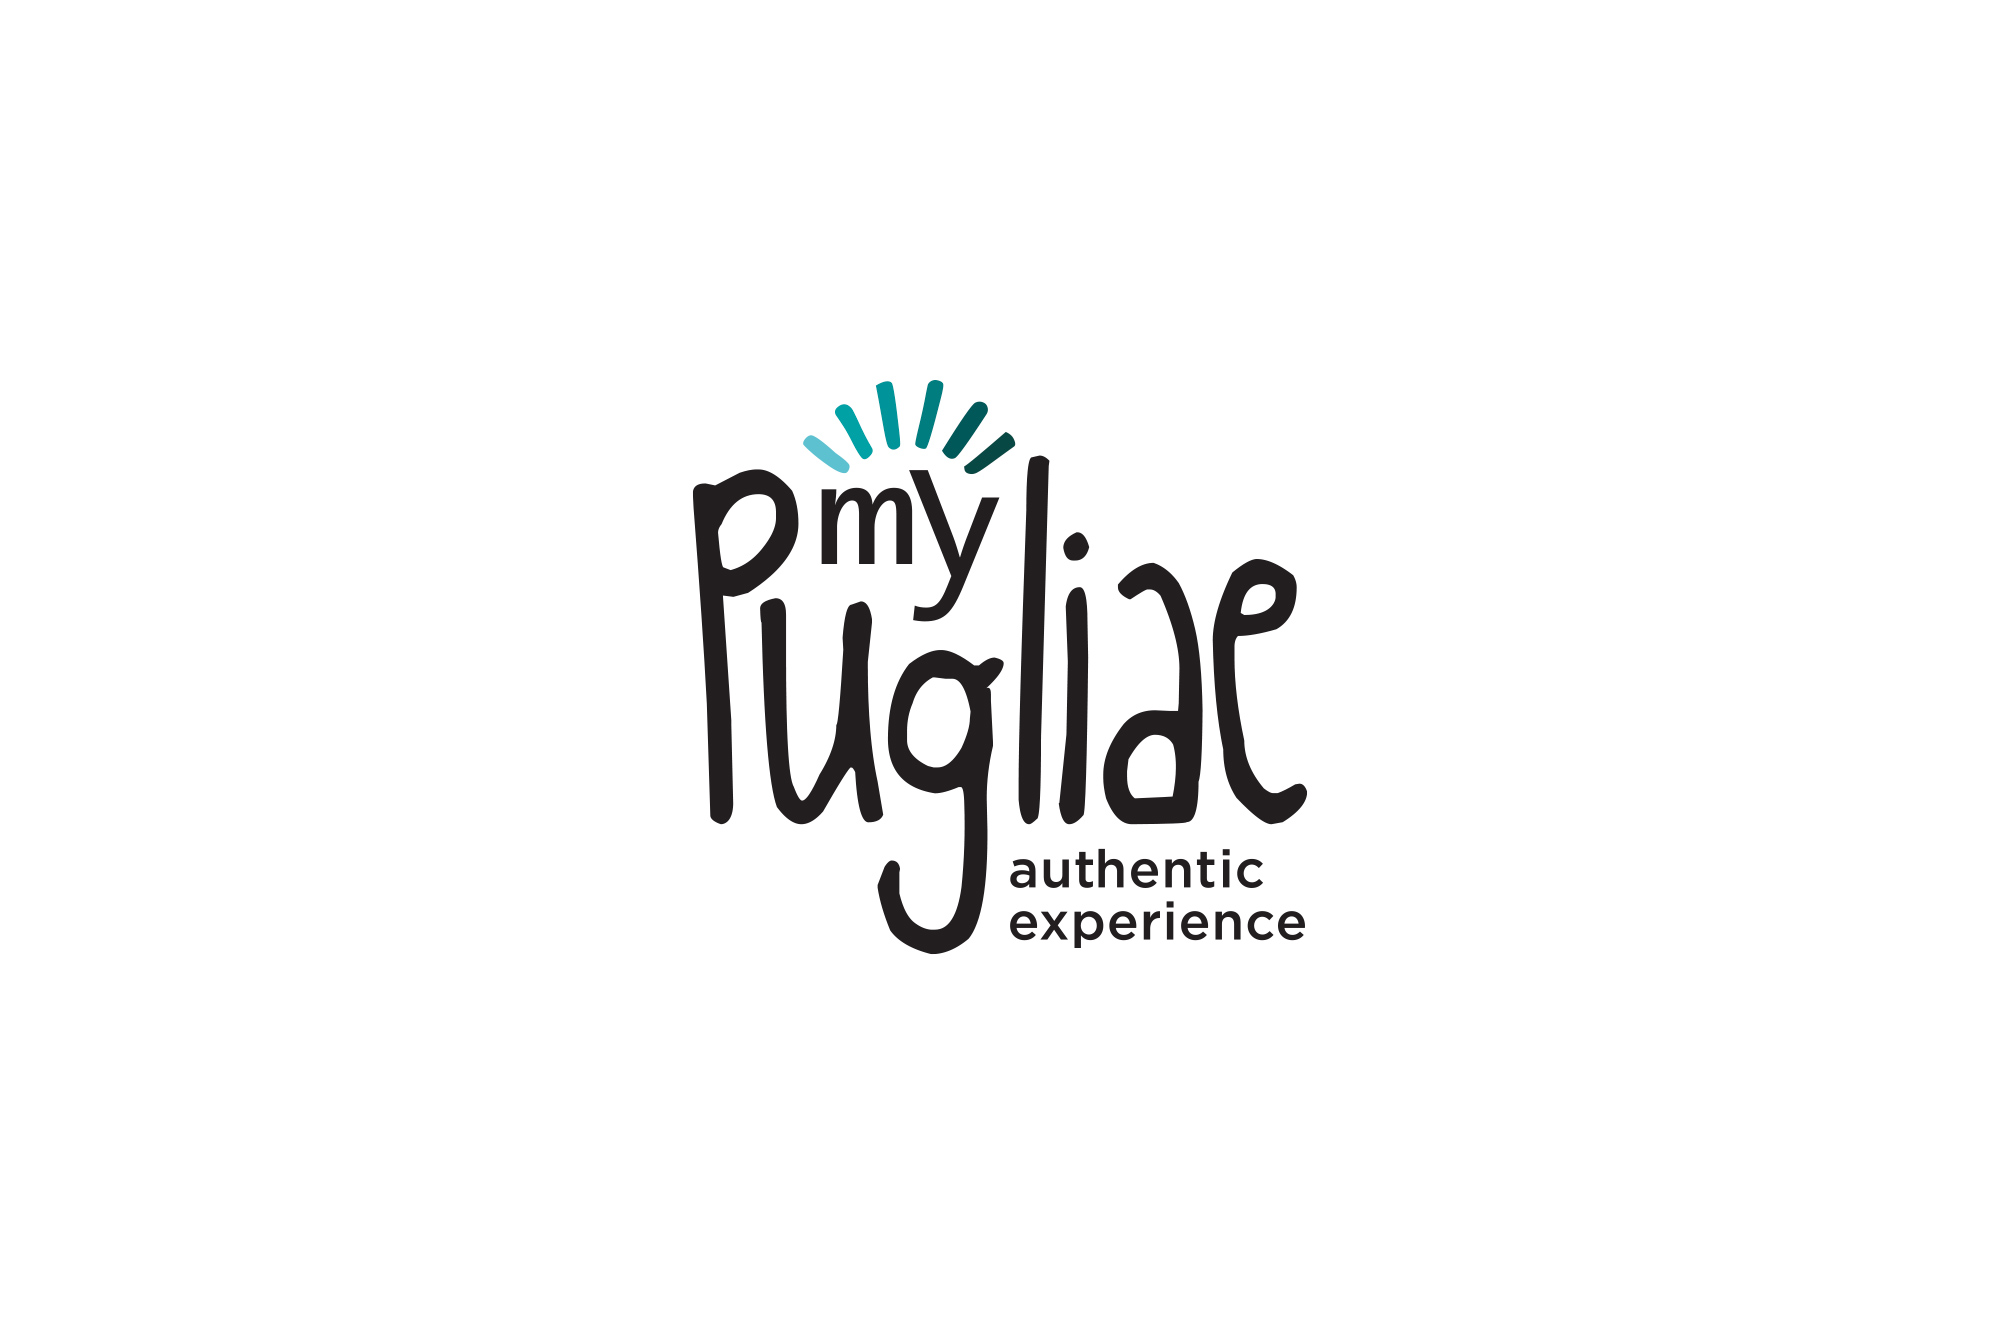 MyPugliae - logo/branding, digital, print - img 1